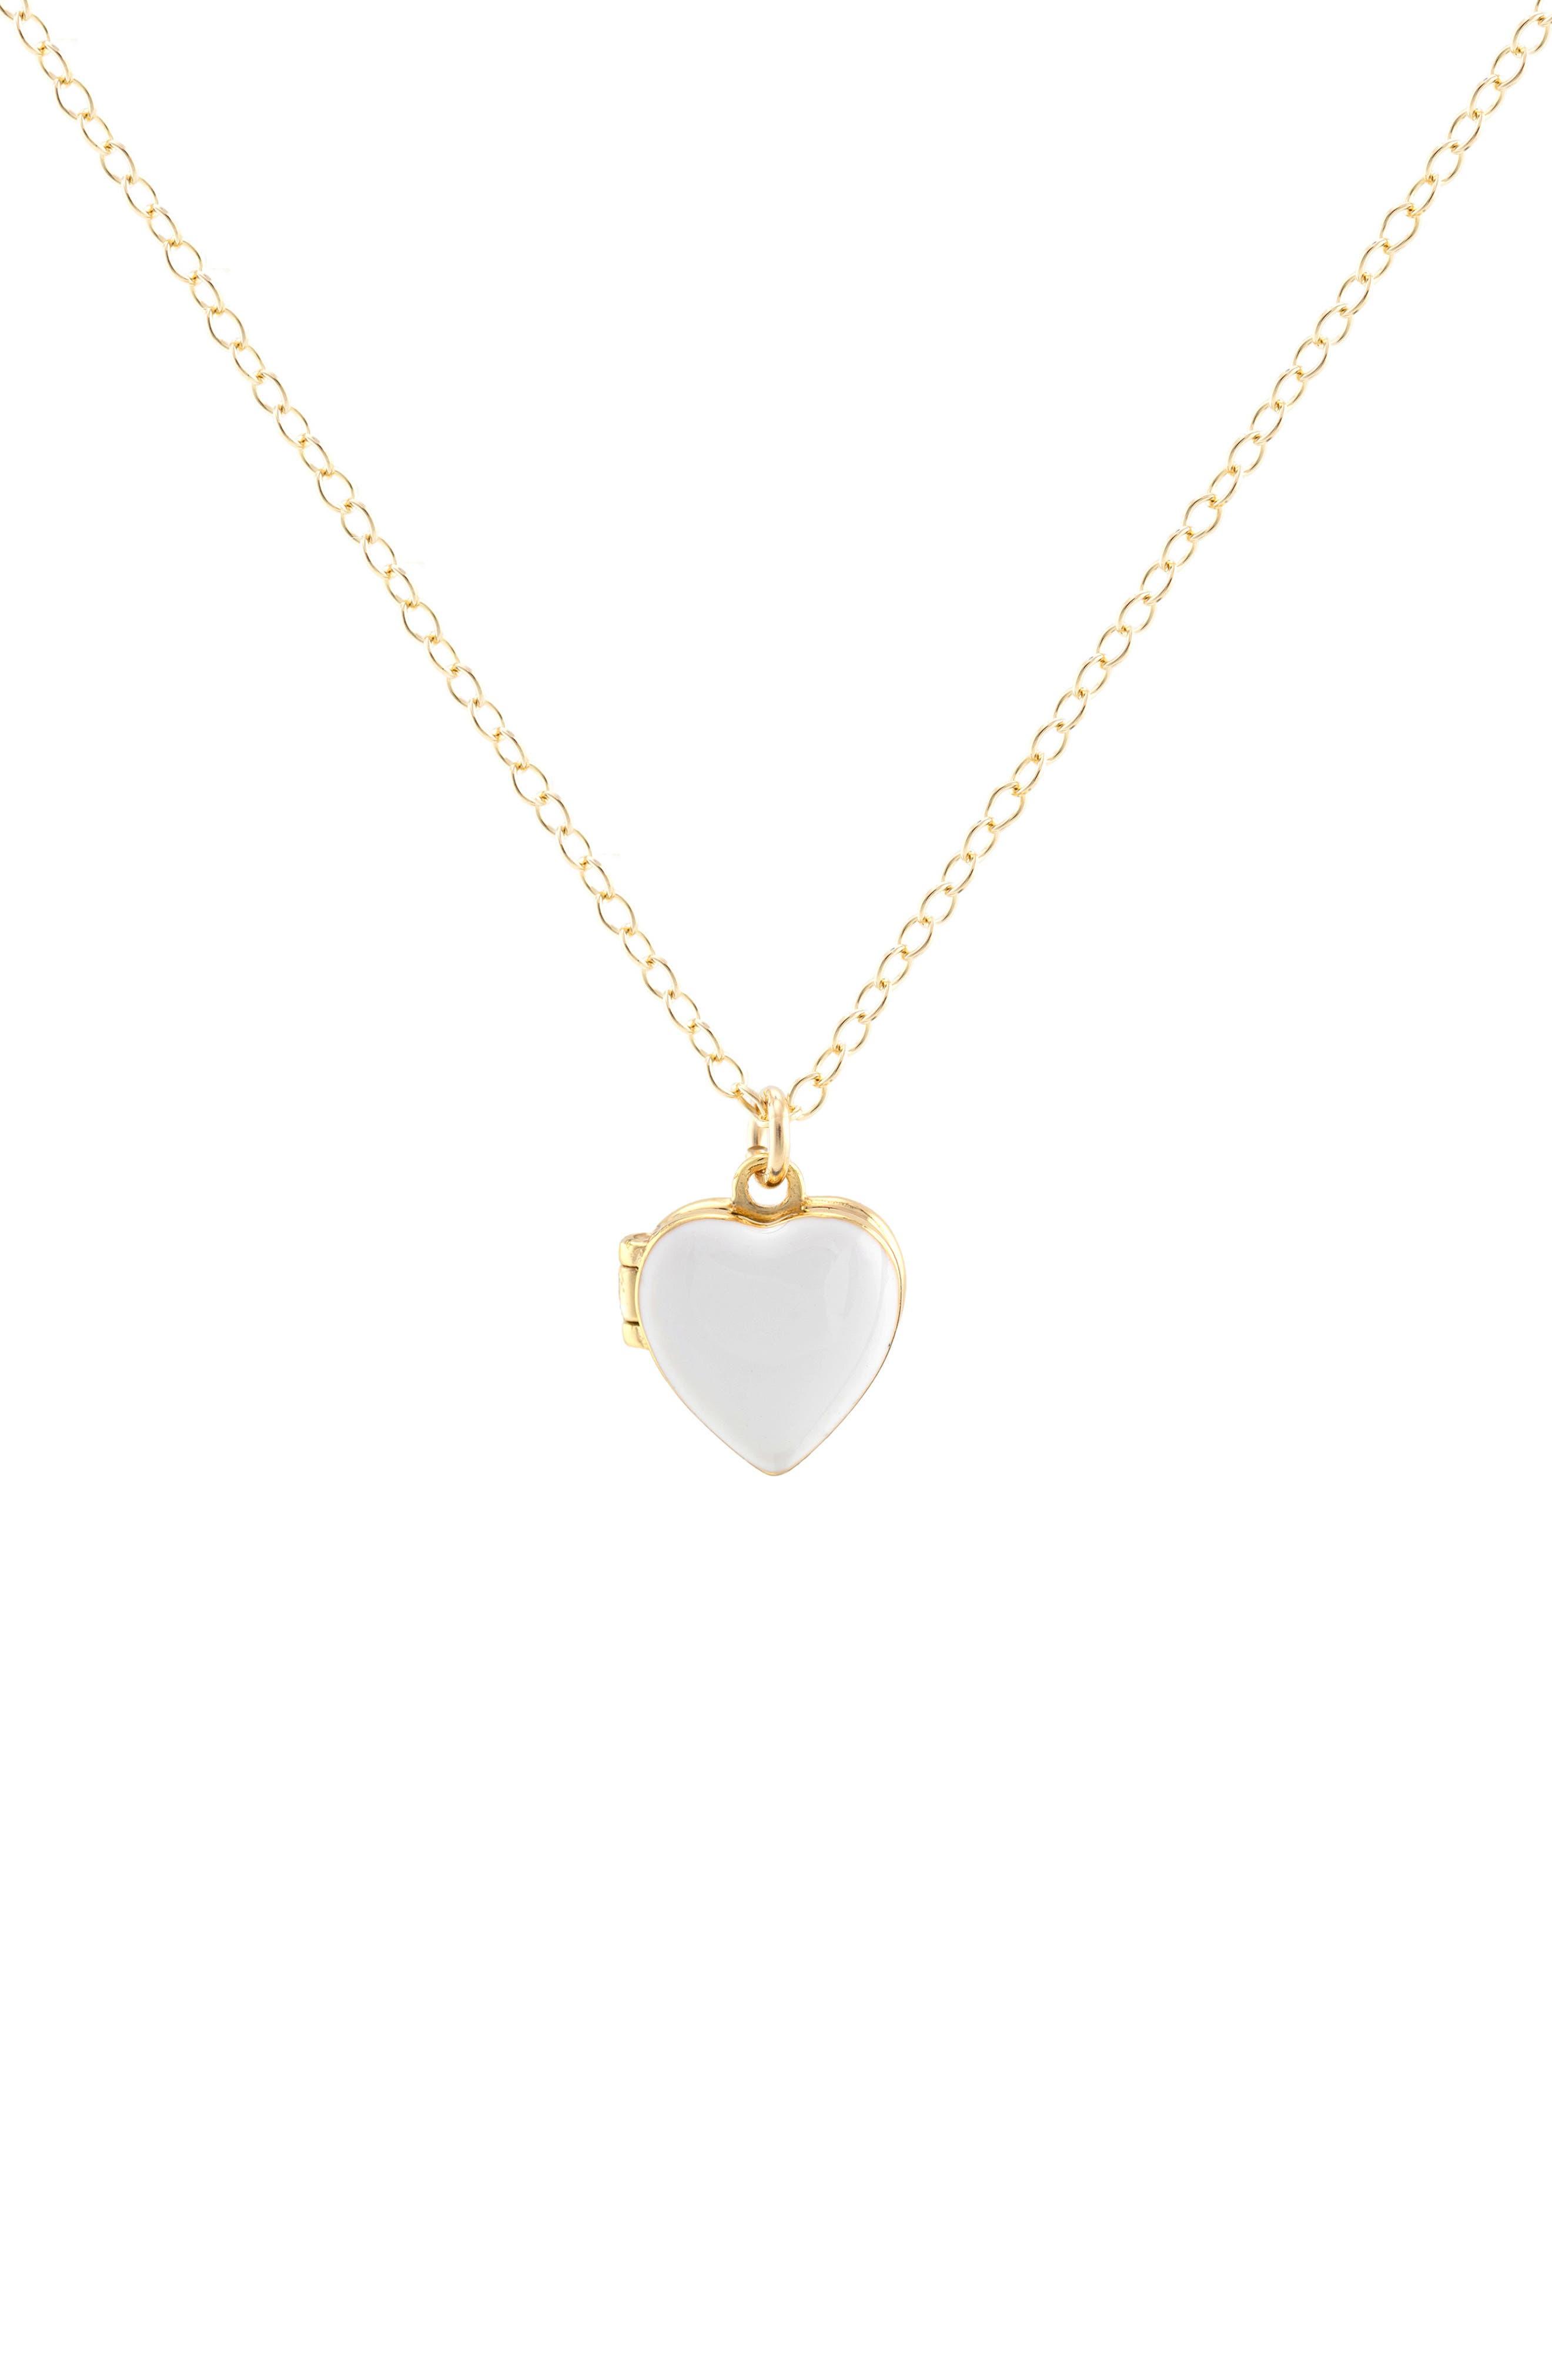 Kris Nations Enamel Heart Locket Necklace in 18K Gold Vermeil /White at Nordstrom